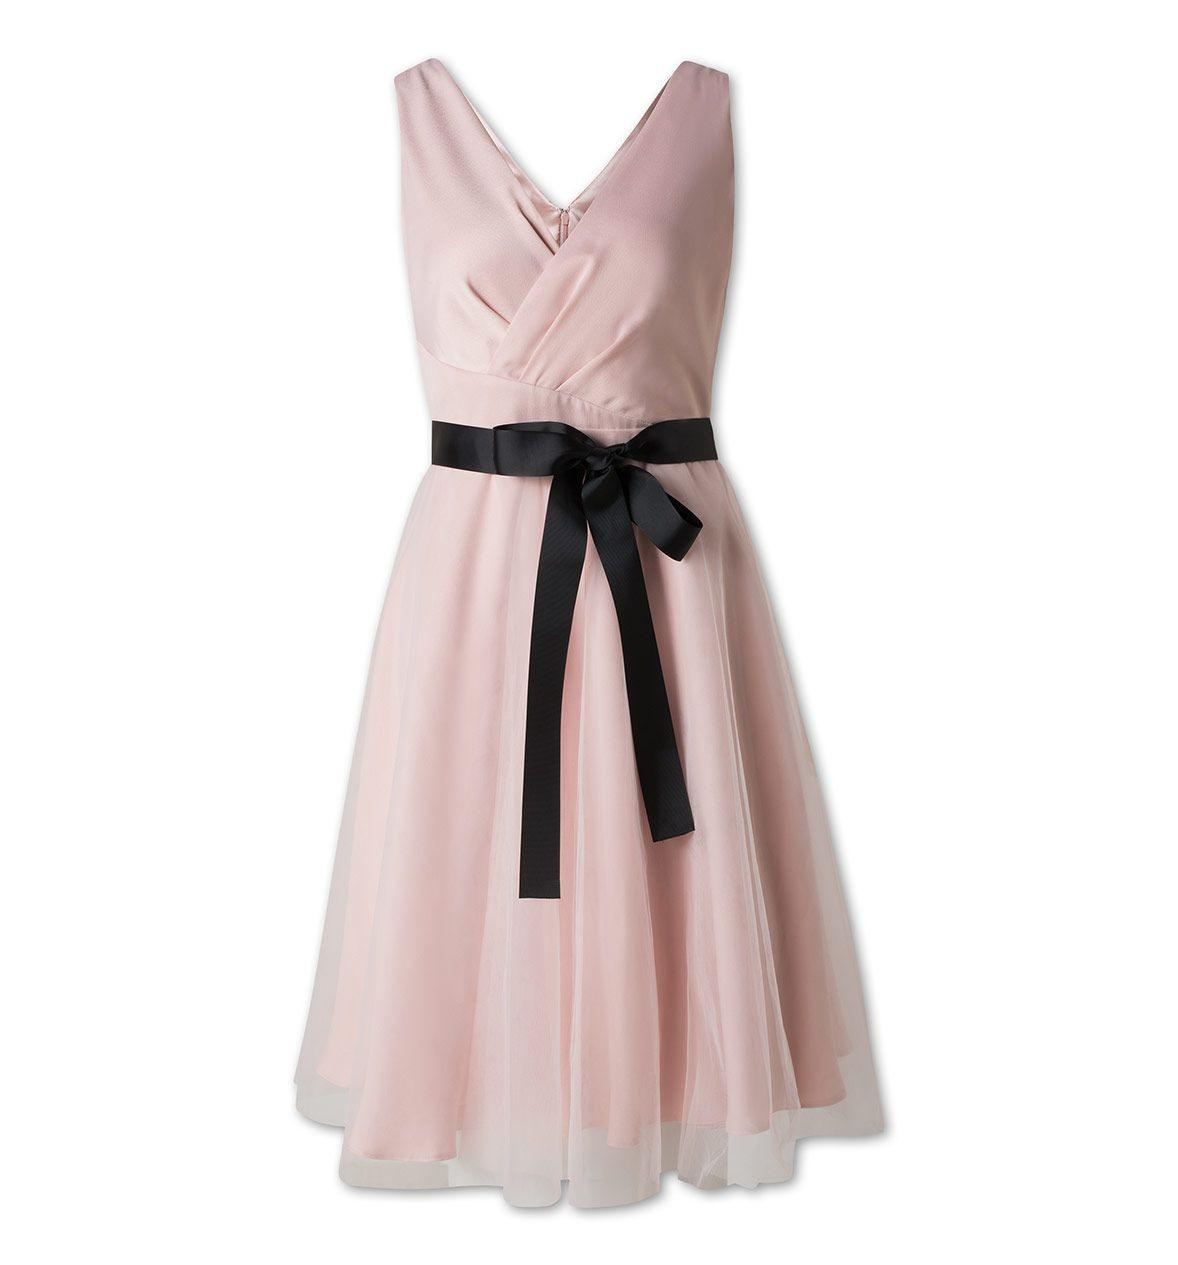 Designer Kreativ C&A Abend Kleider Stylish15 Erstaunlich C&A Abend Kleider Design